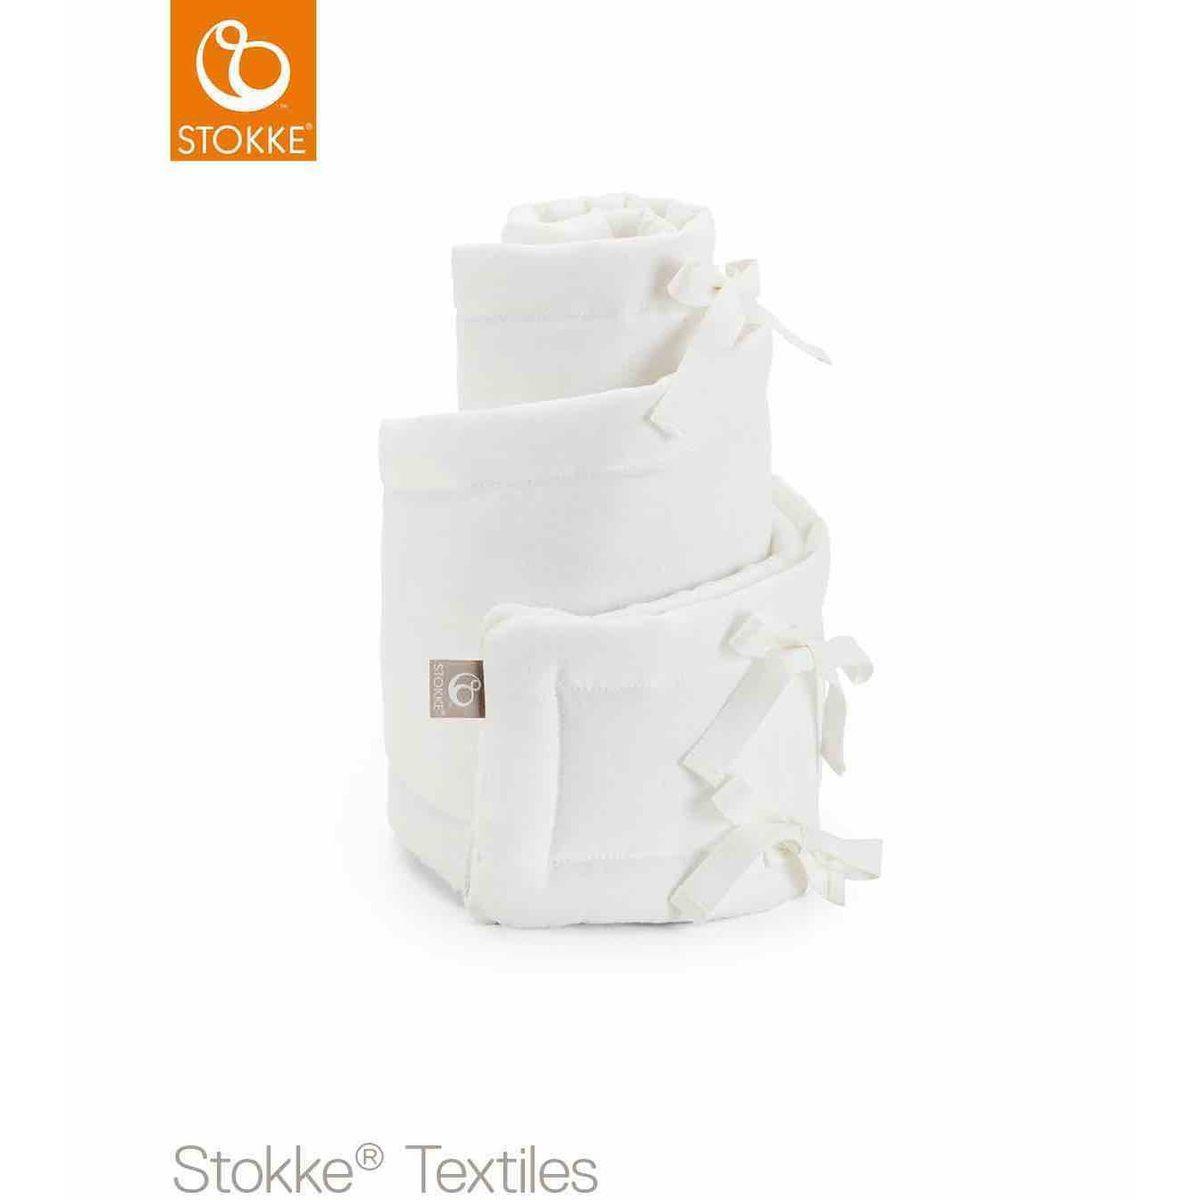 Protector cuna mini SLEEPI Stokke blanco